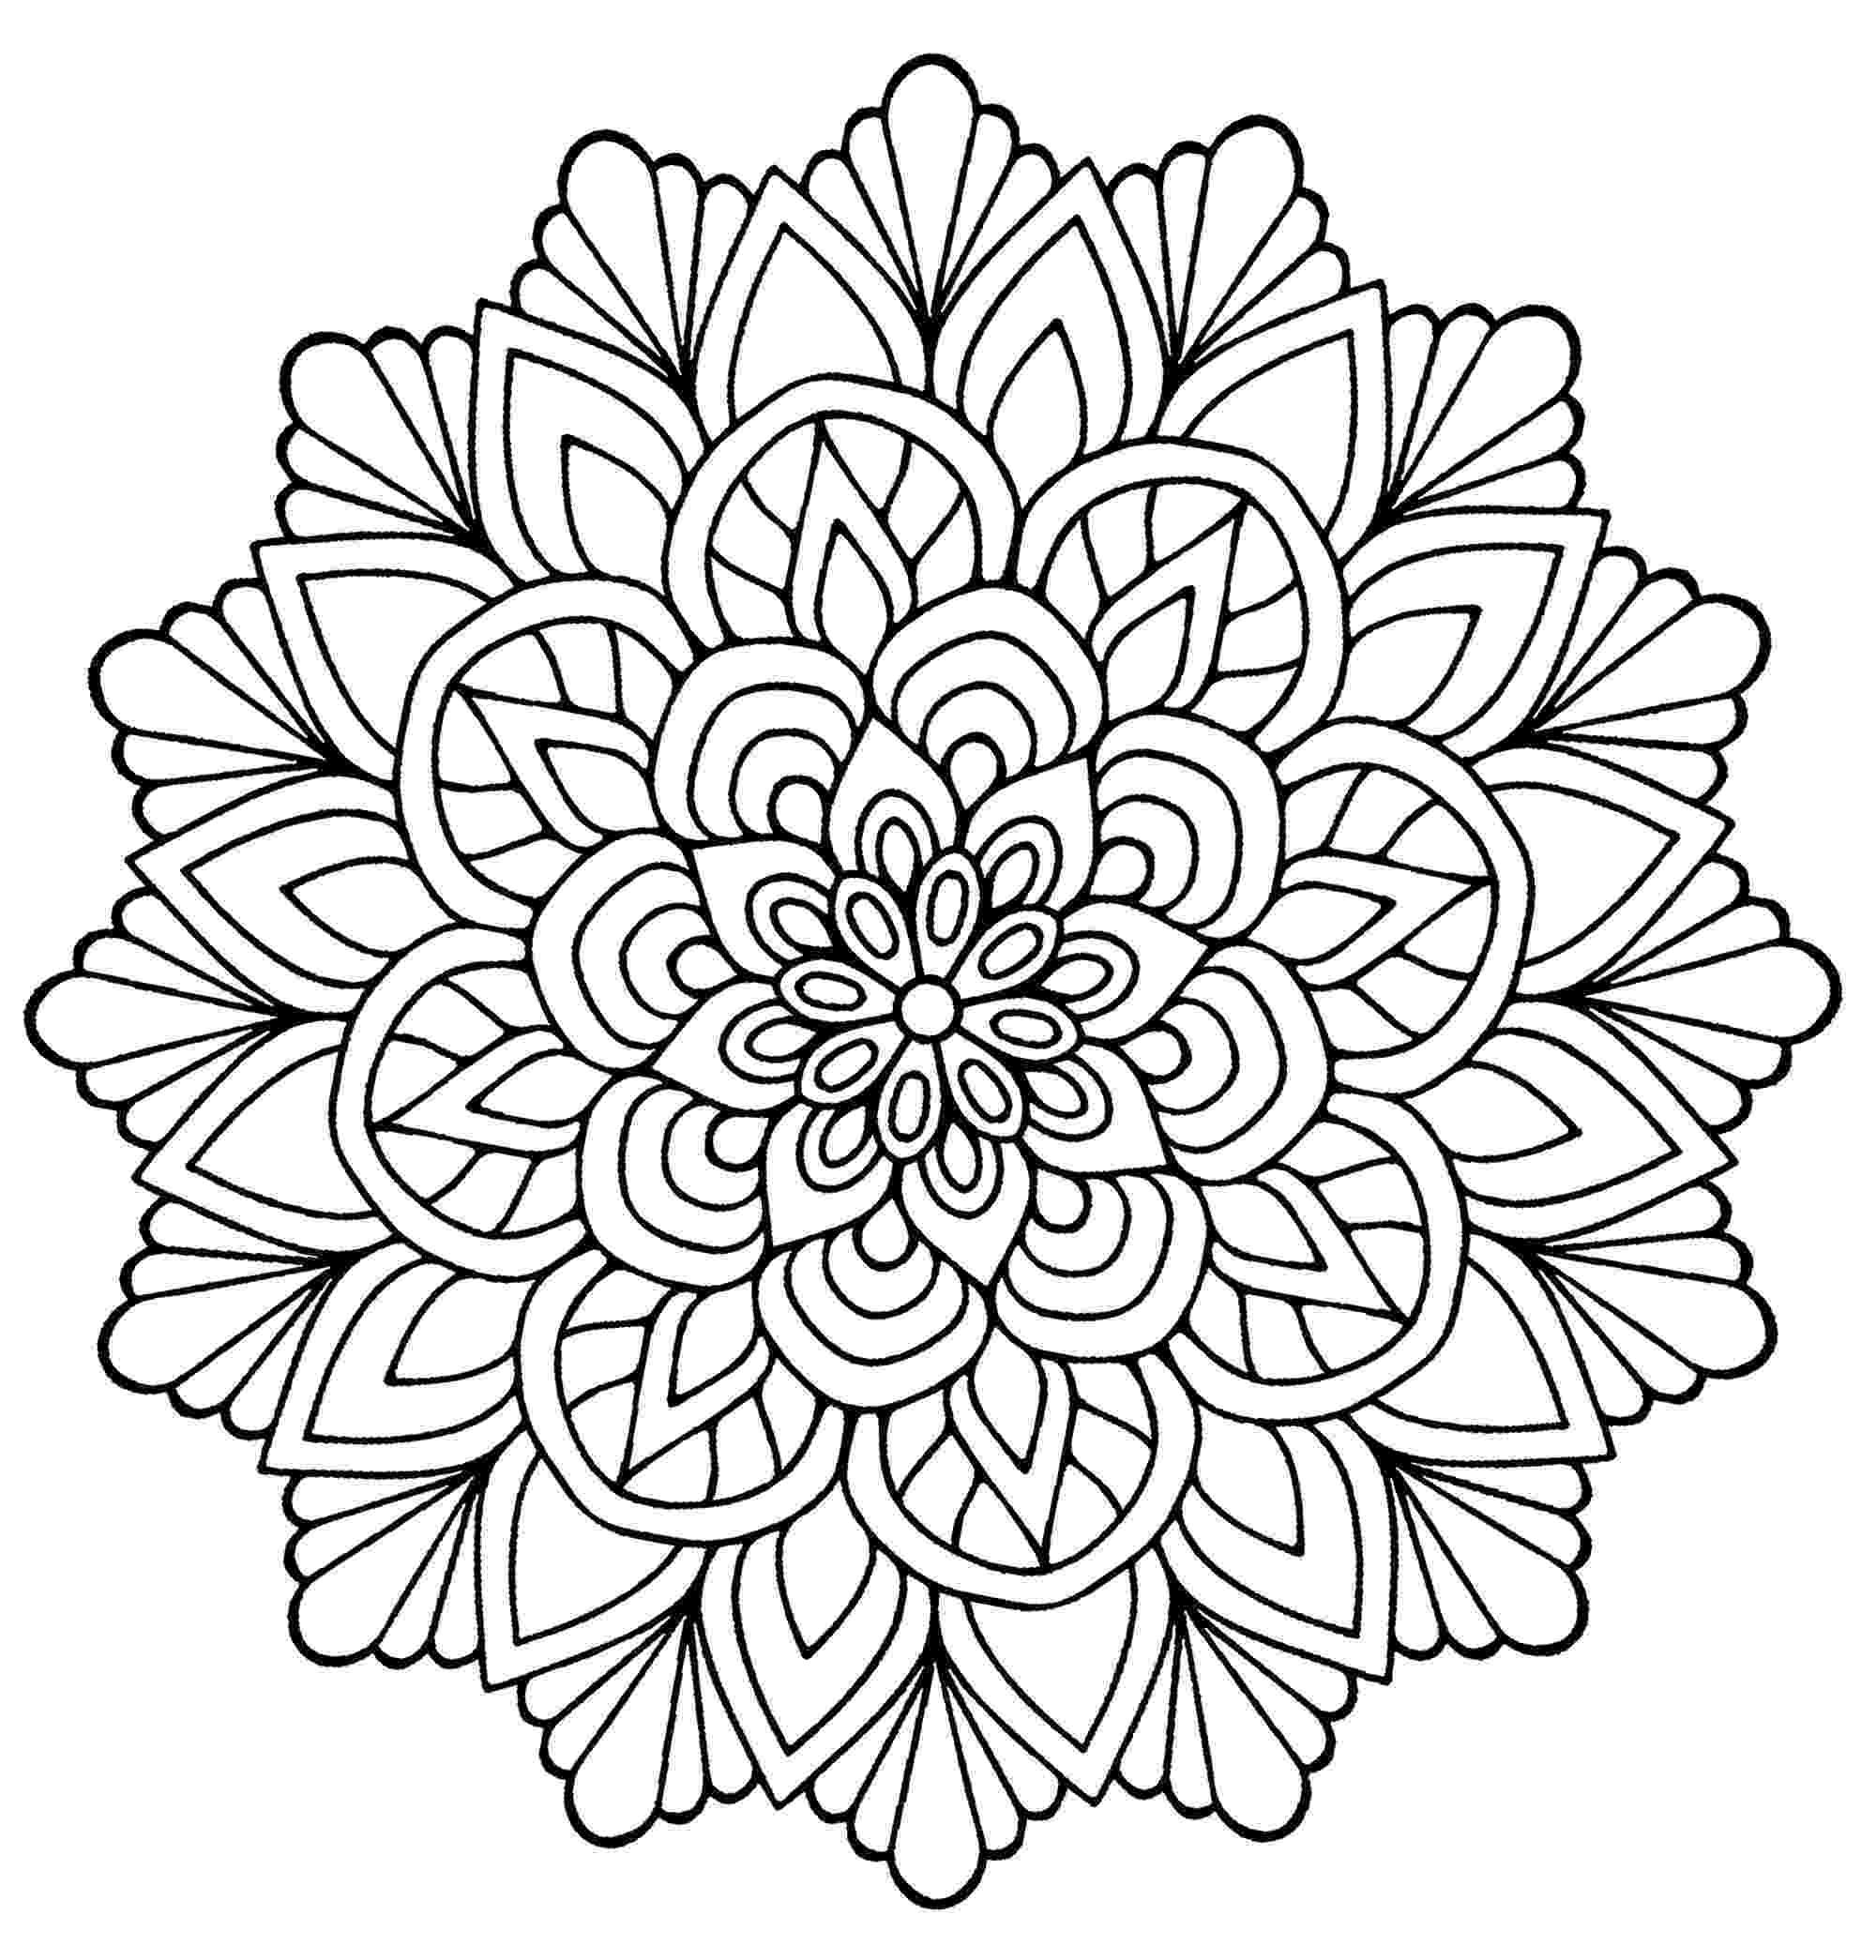 mandala flower flower mandala mandala à colorier coloriage mandala mandala flower